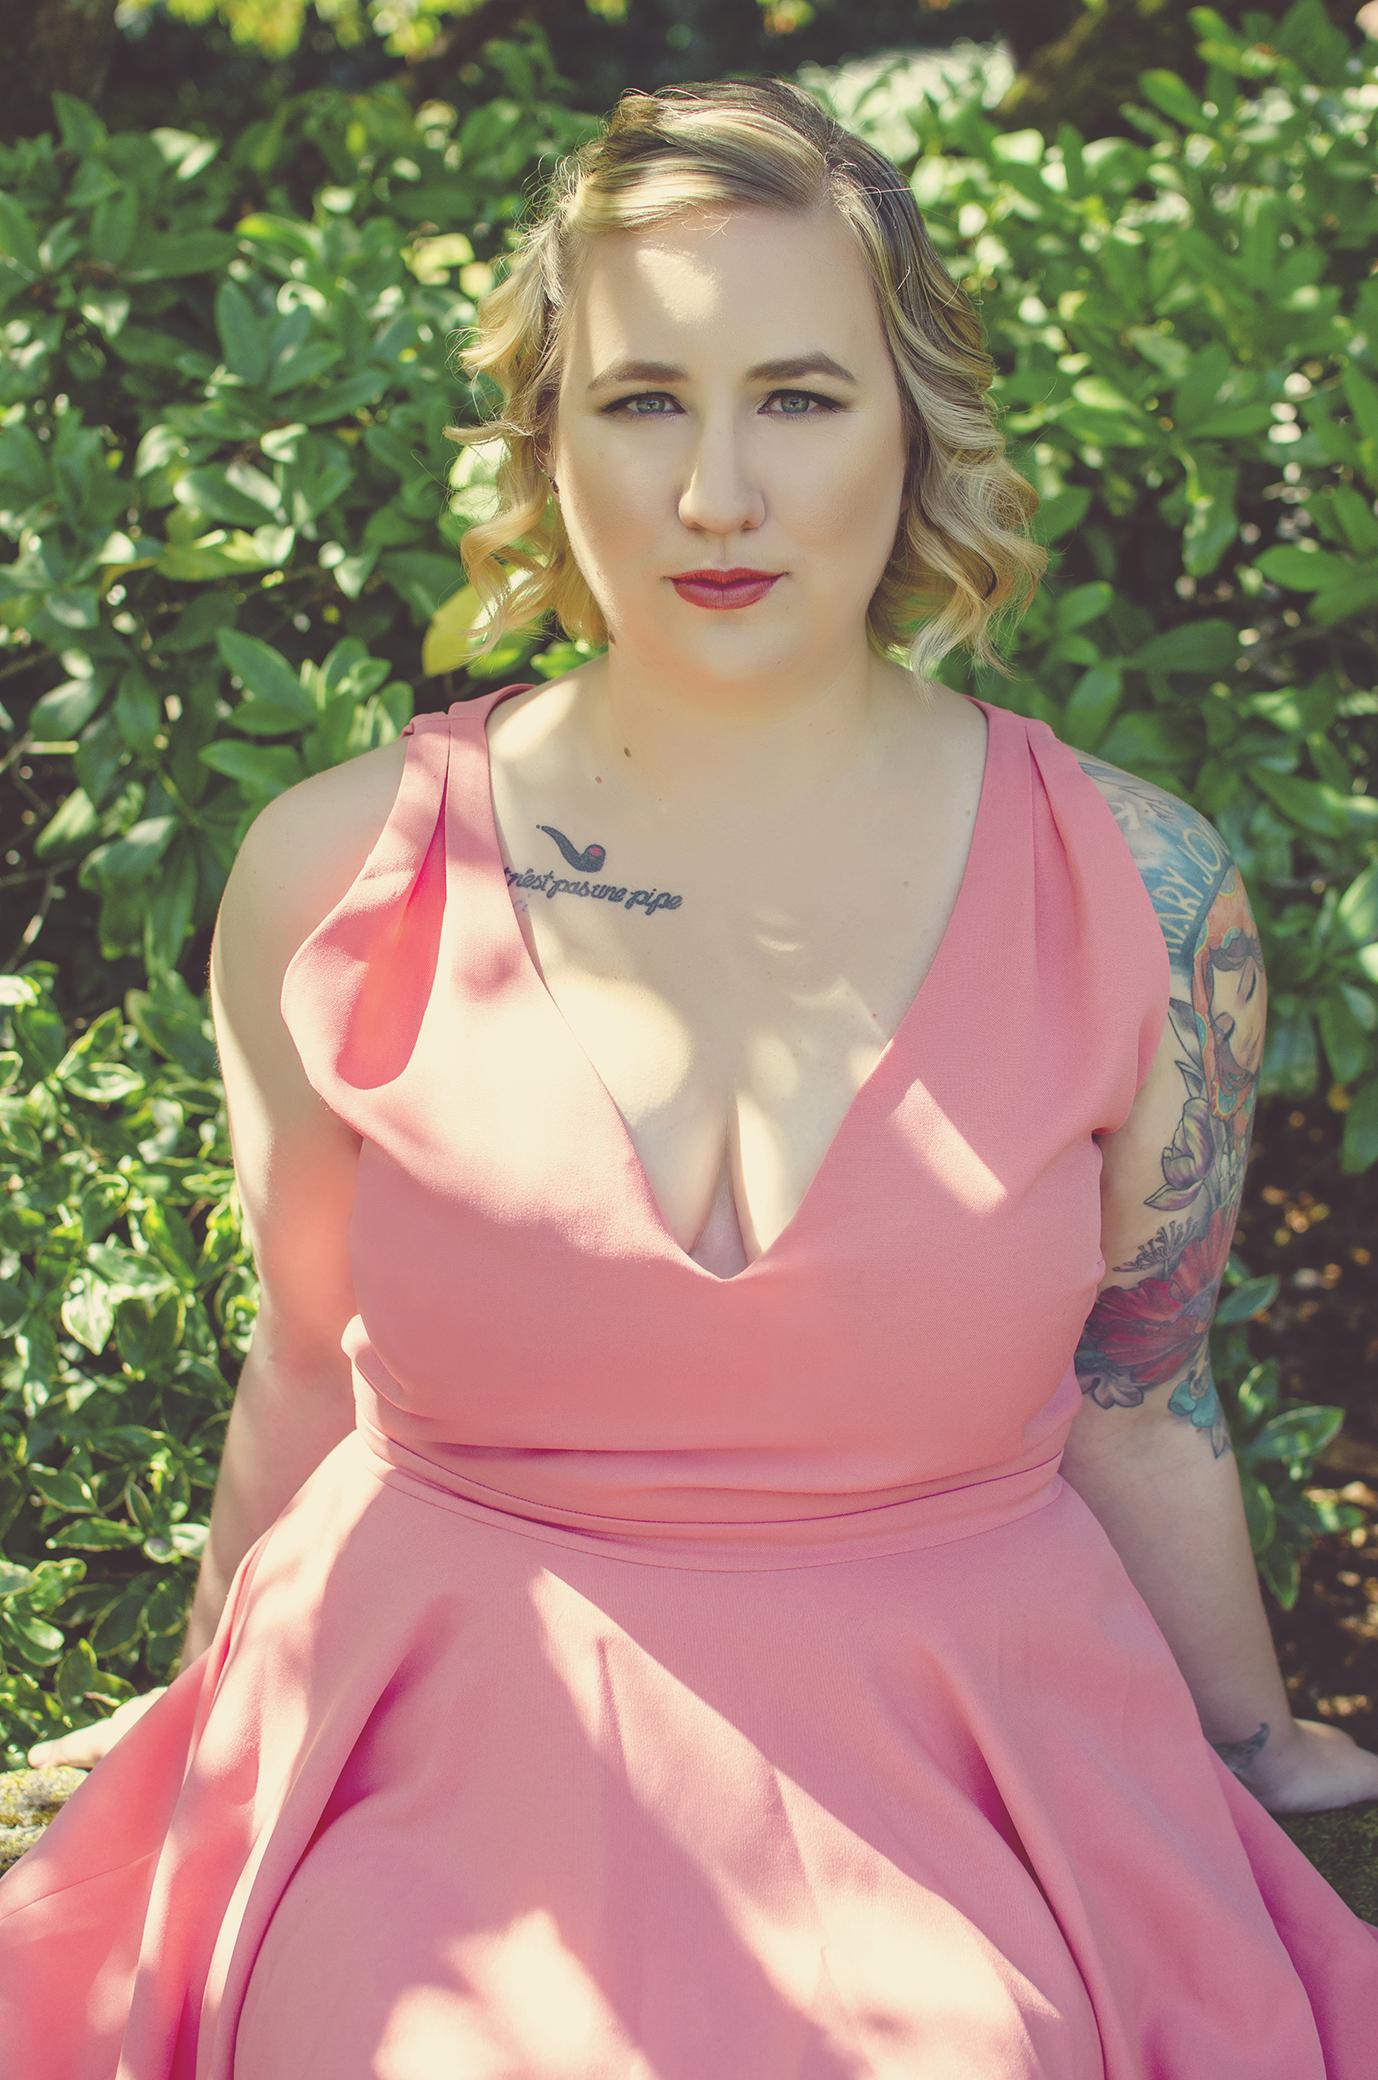 Marisa by Sara Ranlett Photography